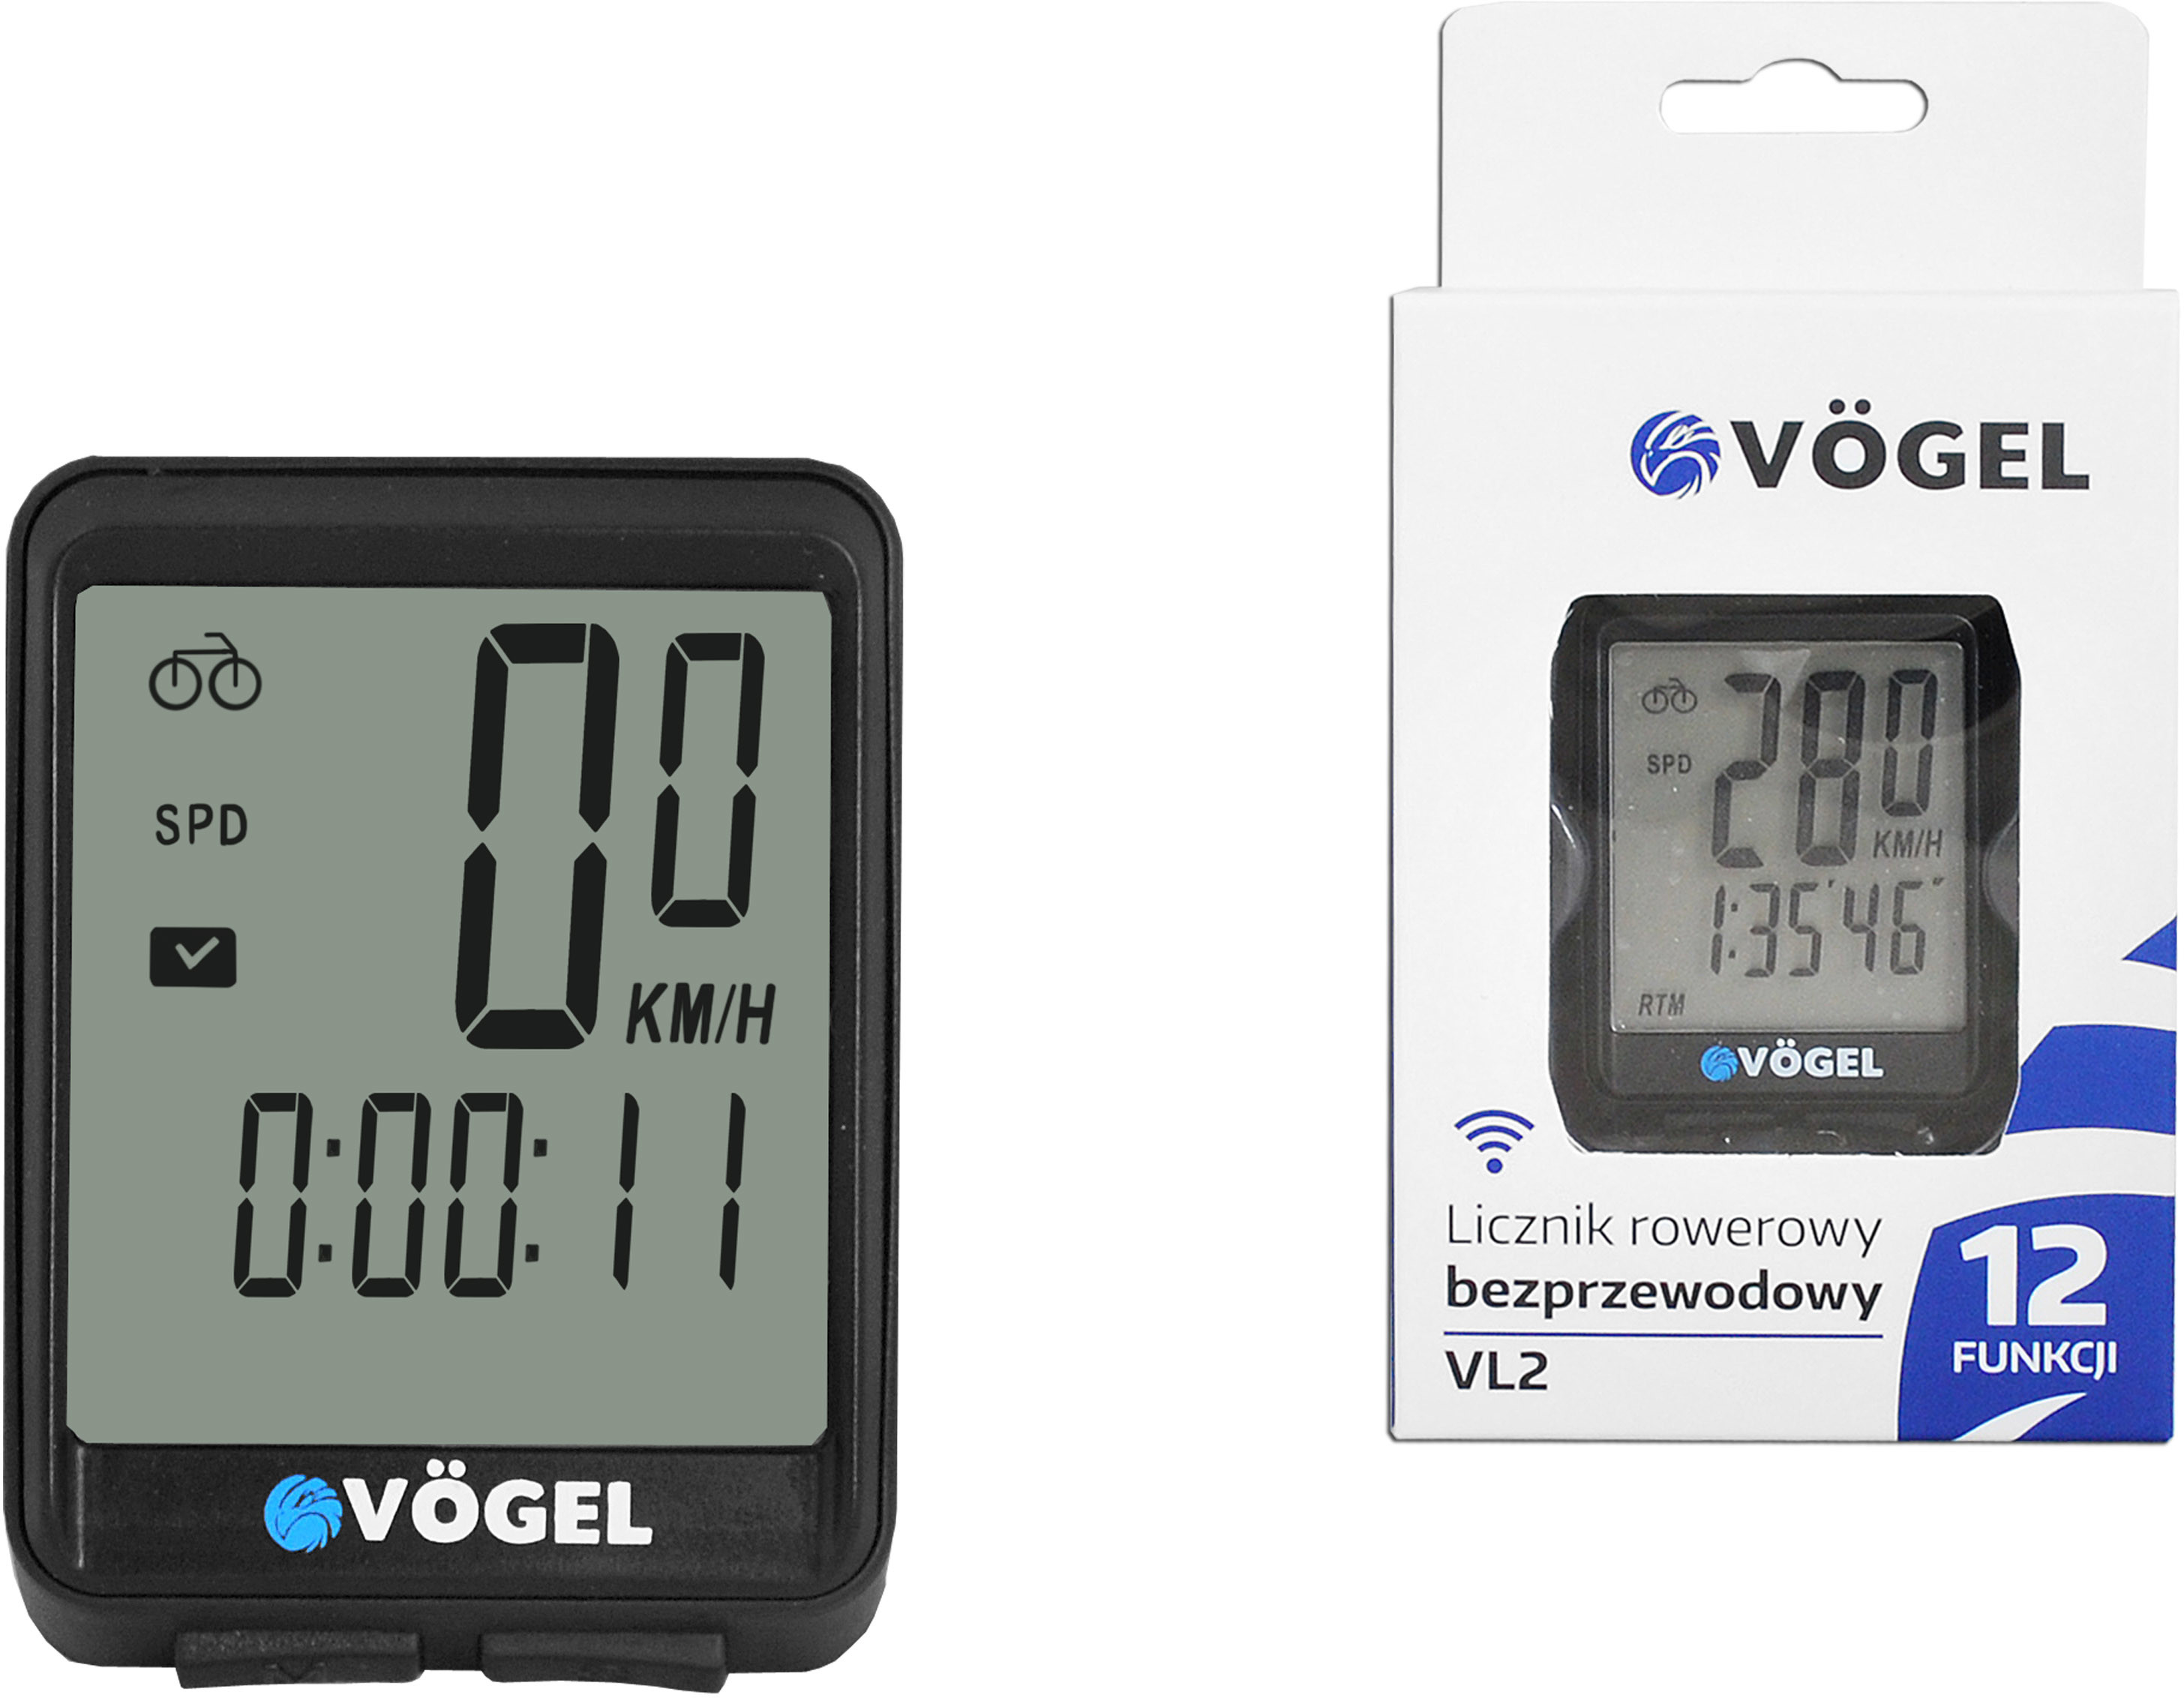 VOGEL VOGEL Licznik rowerowy VOGEL VL2 VL2 VL2